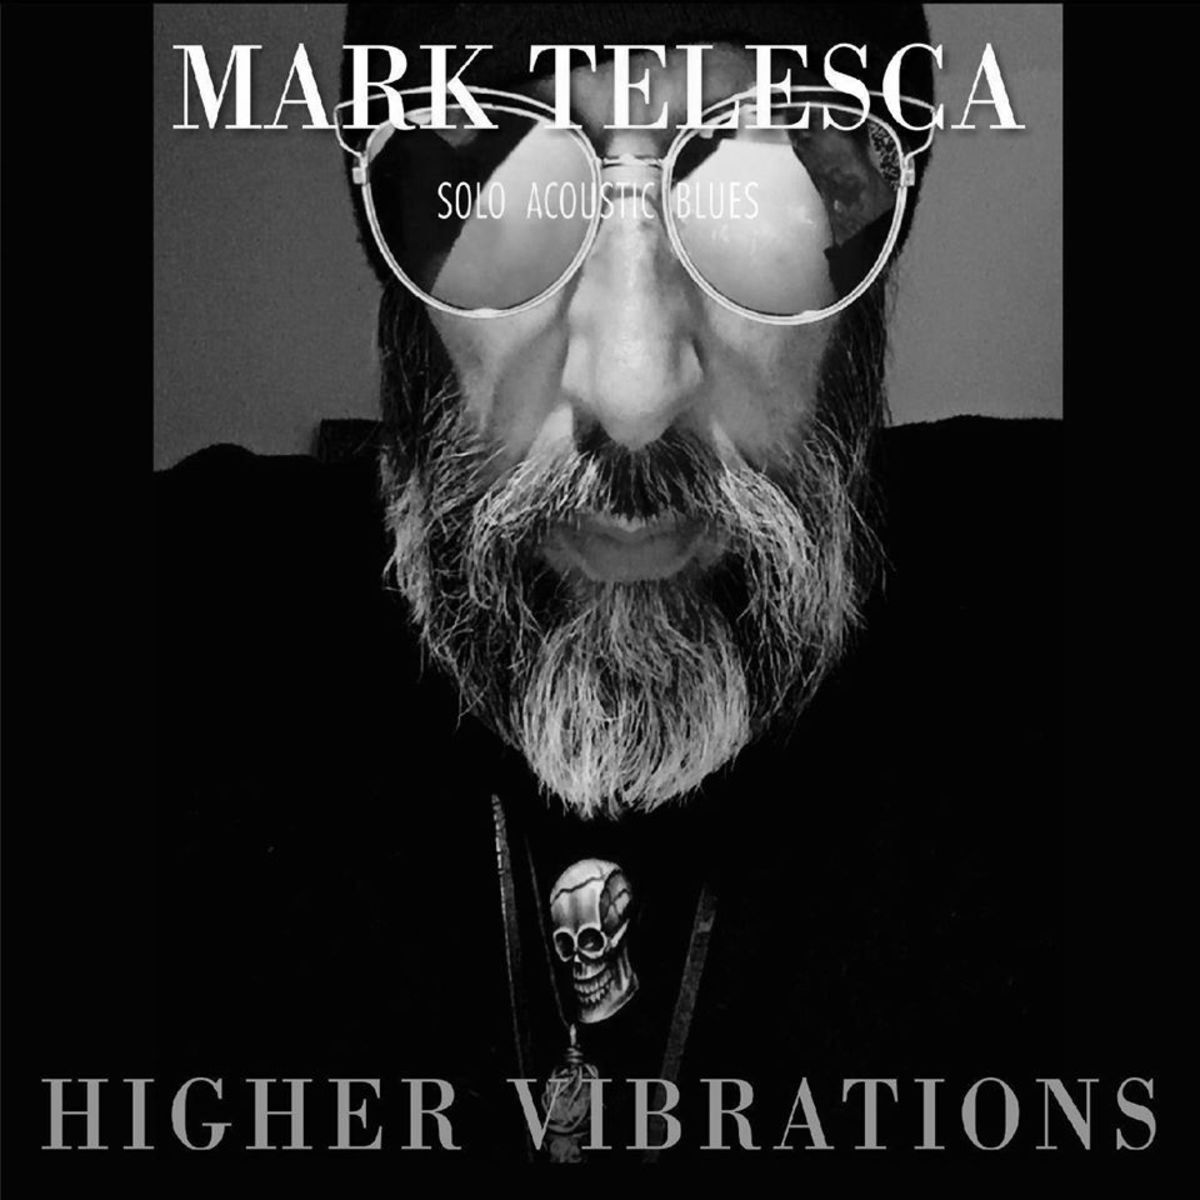 Mark Telesca-Higher Vibrations CD Cover [107965]